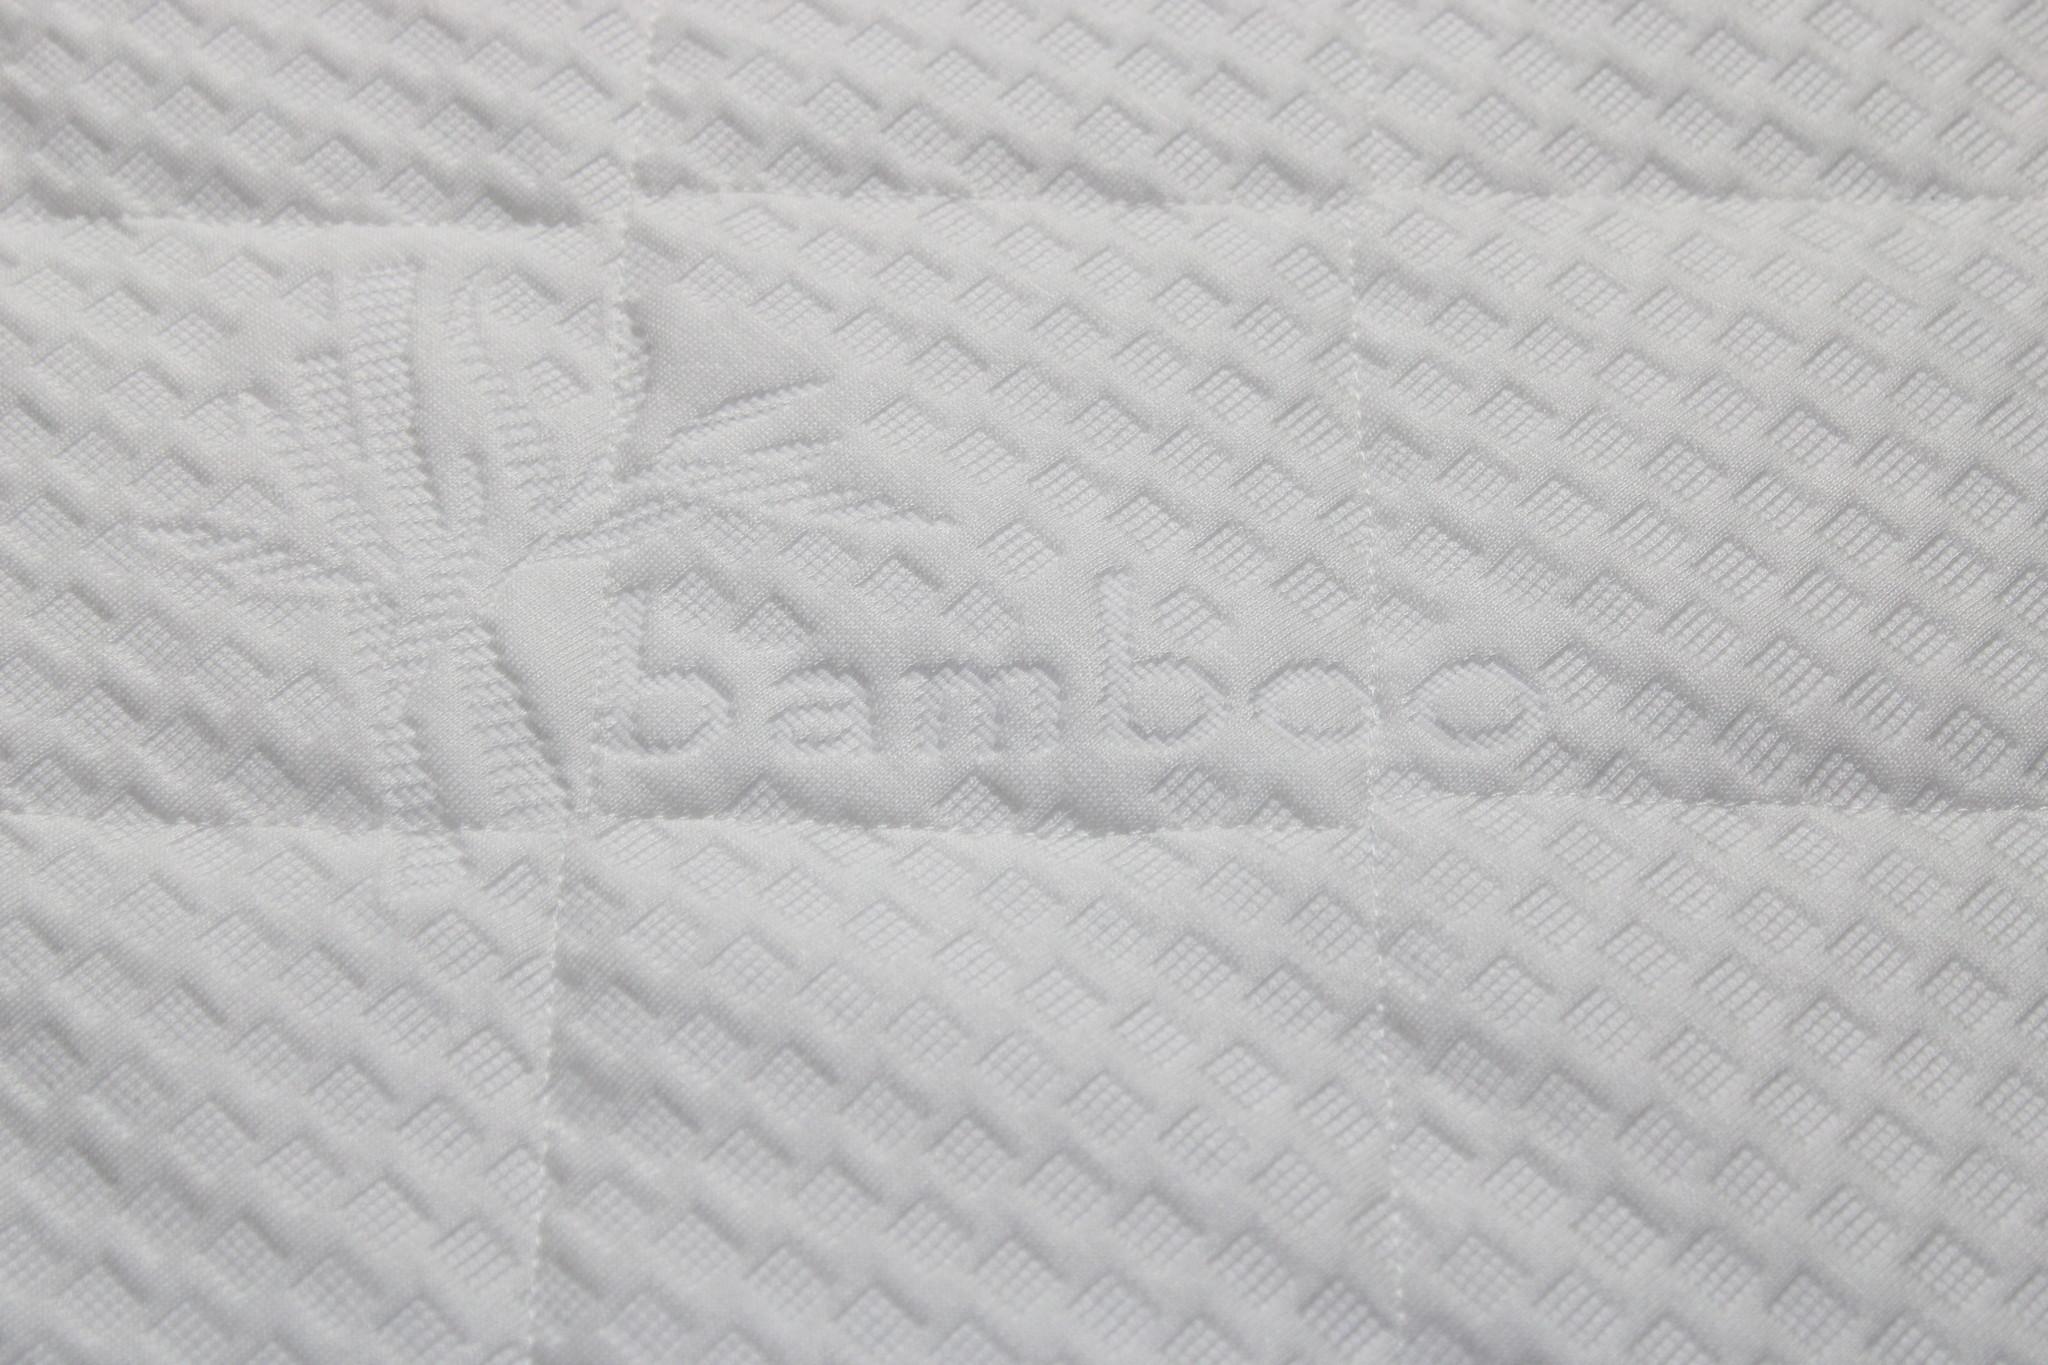 Sarpy Kindermatras 90x160 koudschuim hr40 bamboo